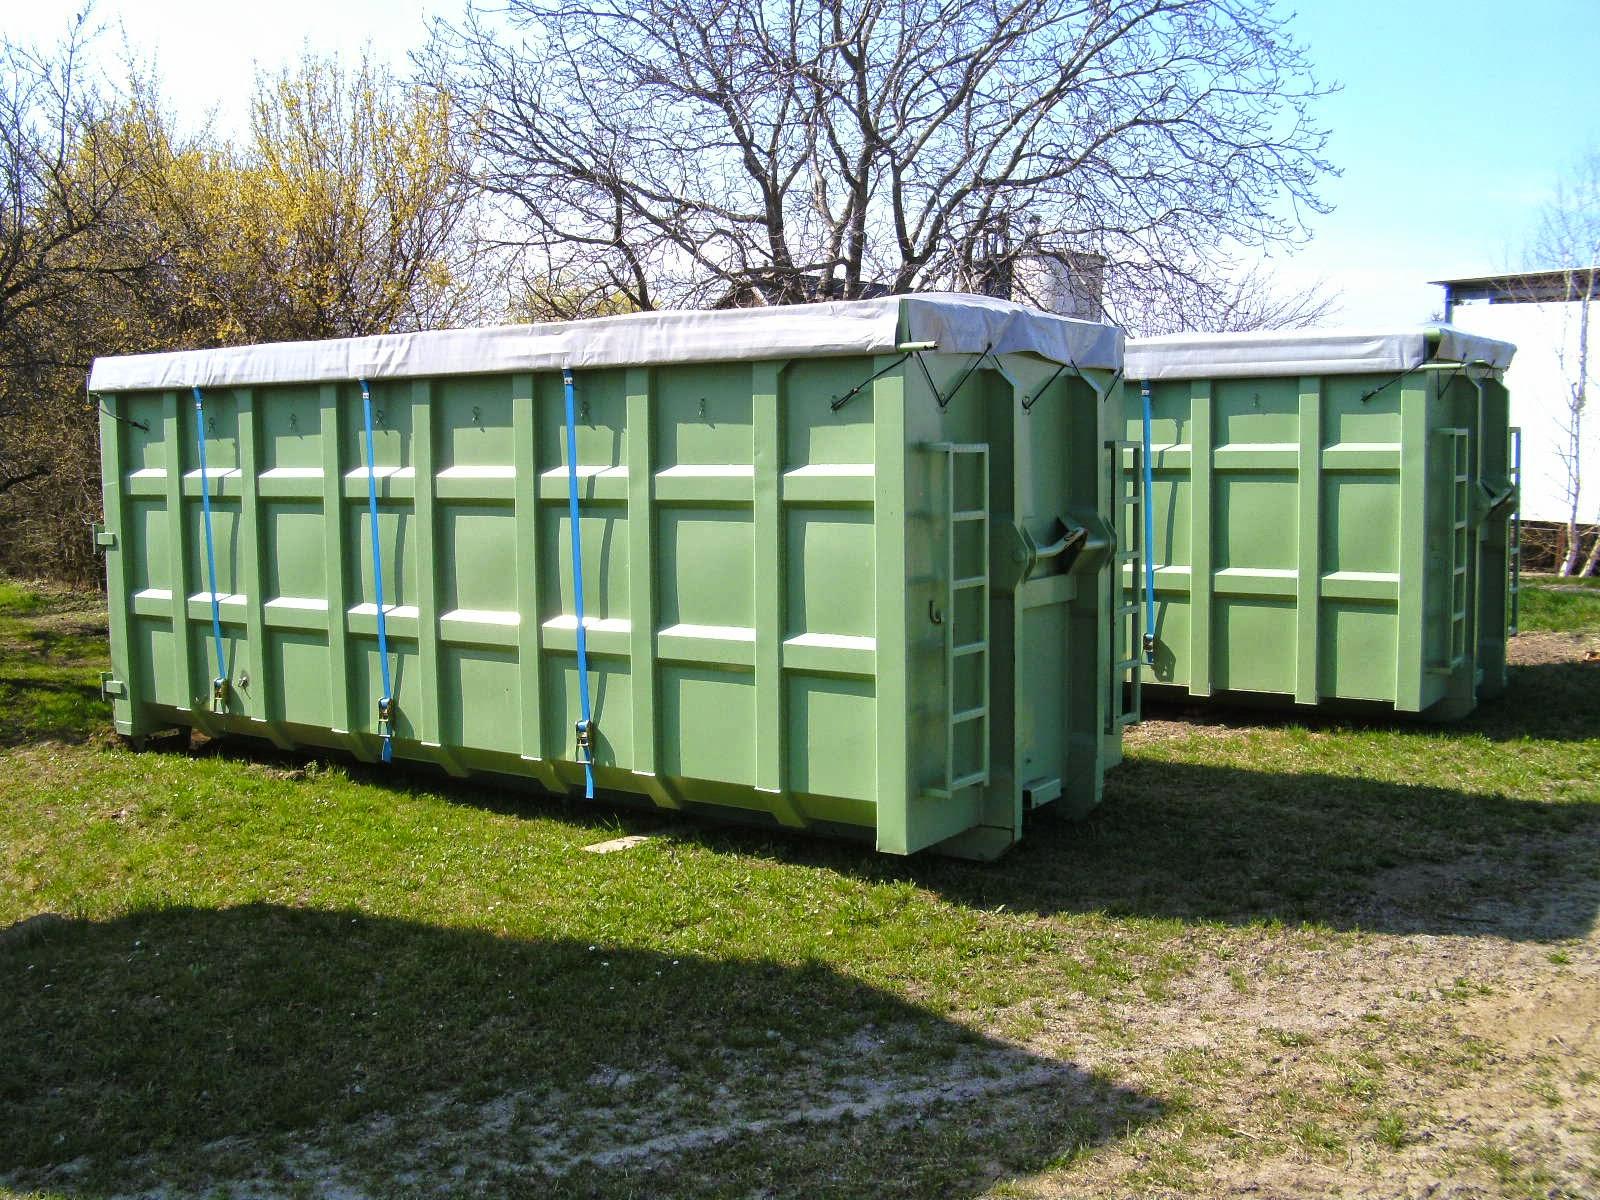 Atemberaubend hfk service: vermietung hakenlift-container #SA_93